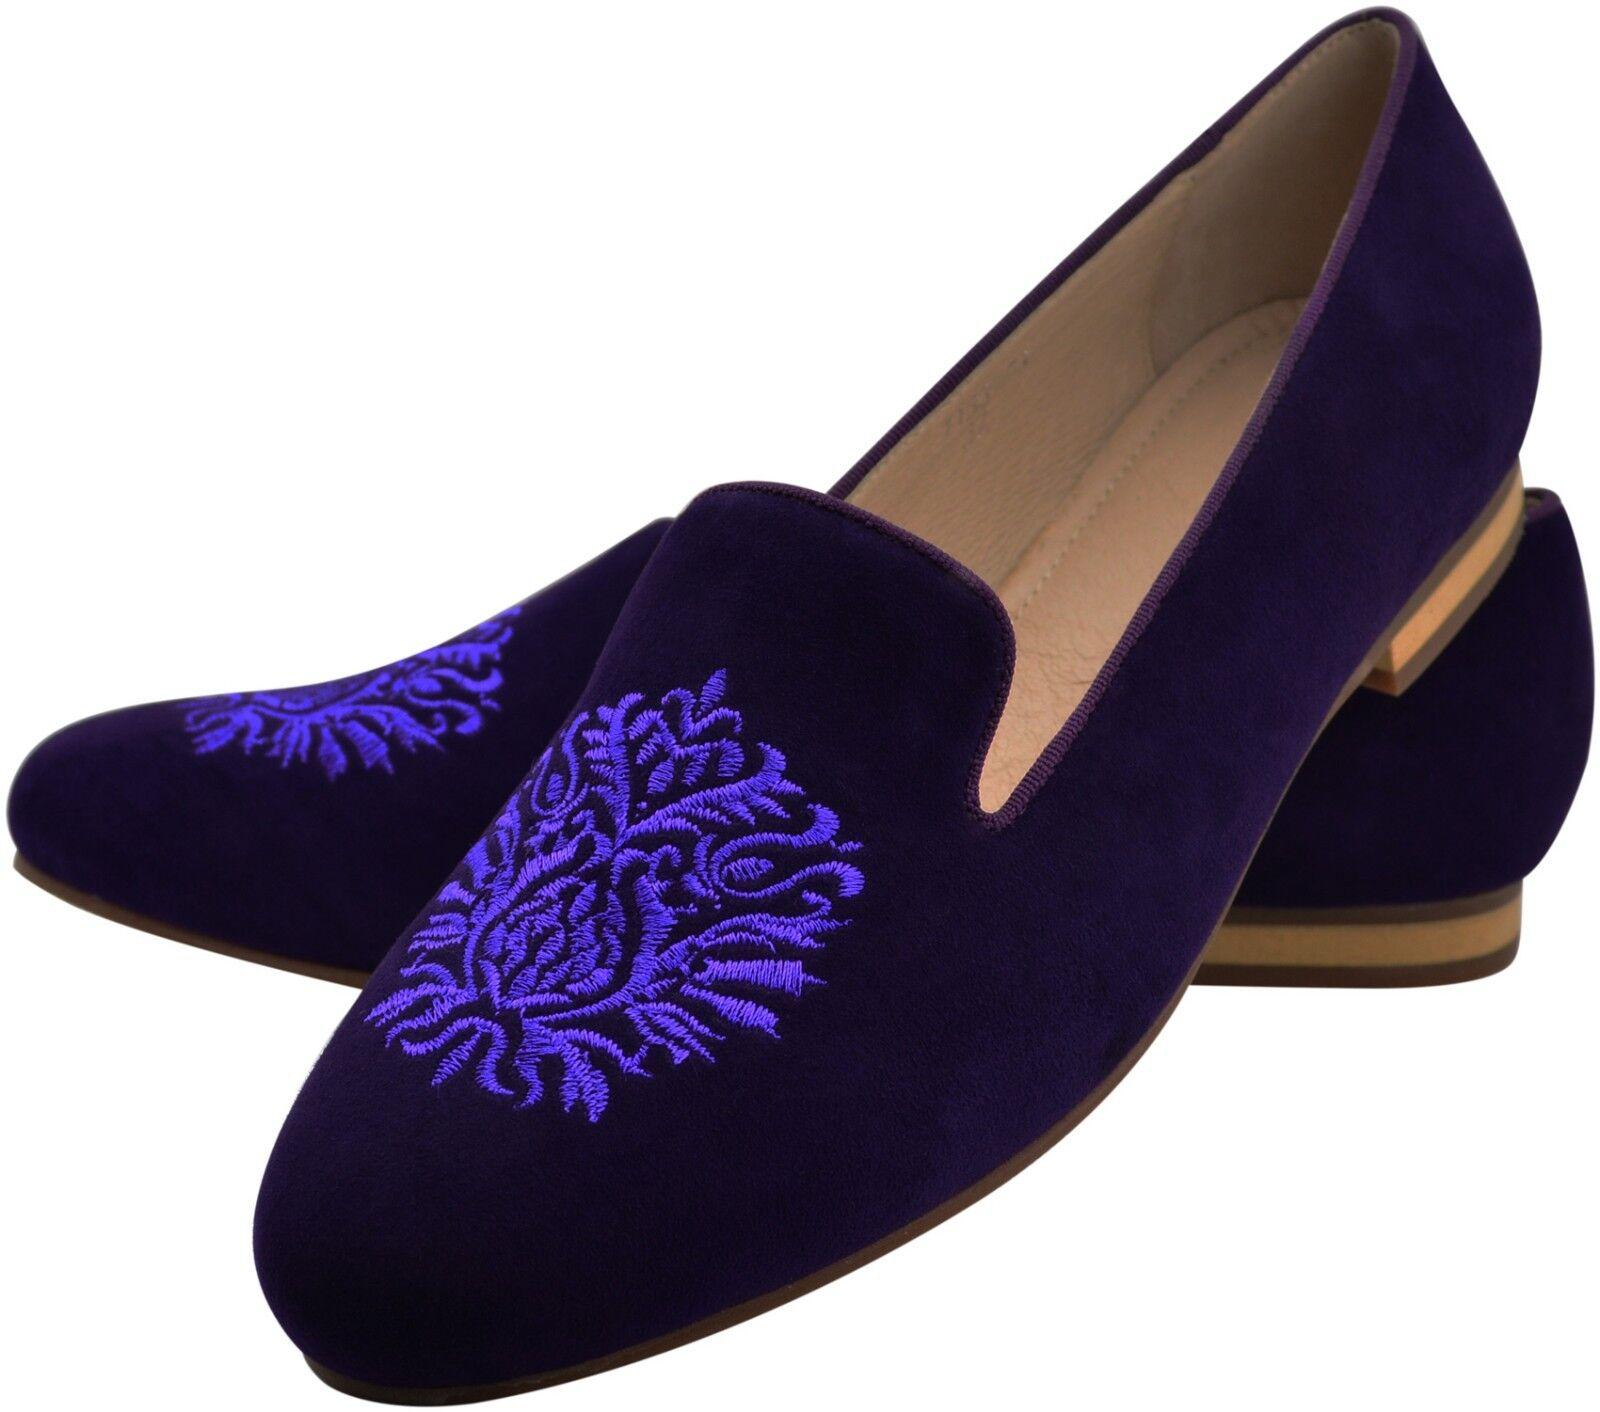 Cuir Slipper Mocassins violet violet chaussures BLASON Stick Taille 41 costume traditionnel brodé